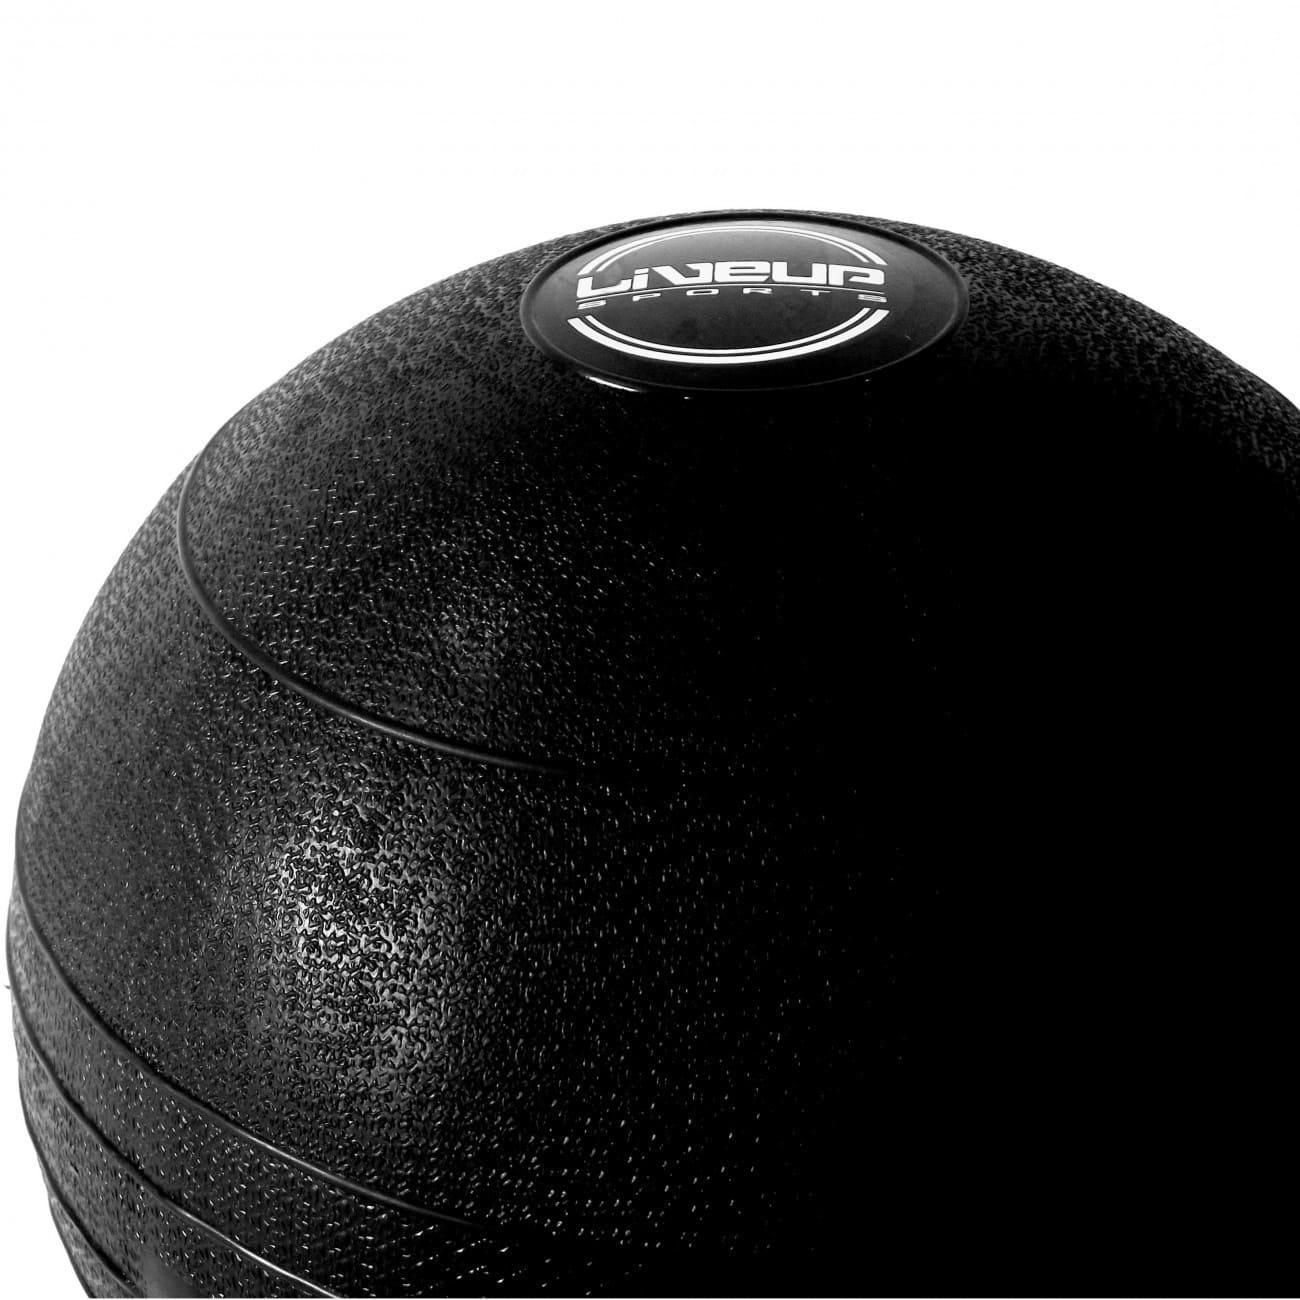 SLAM BALL C - 8KG - LIVEUP SPORTS